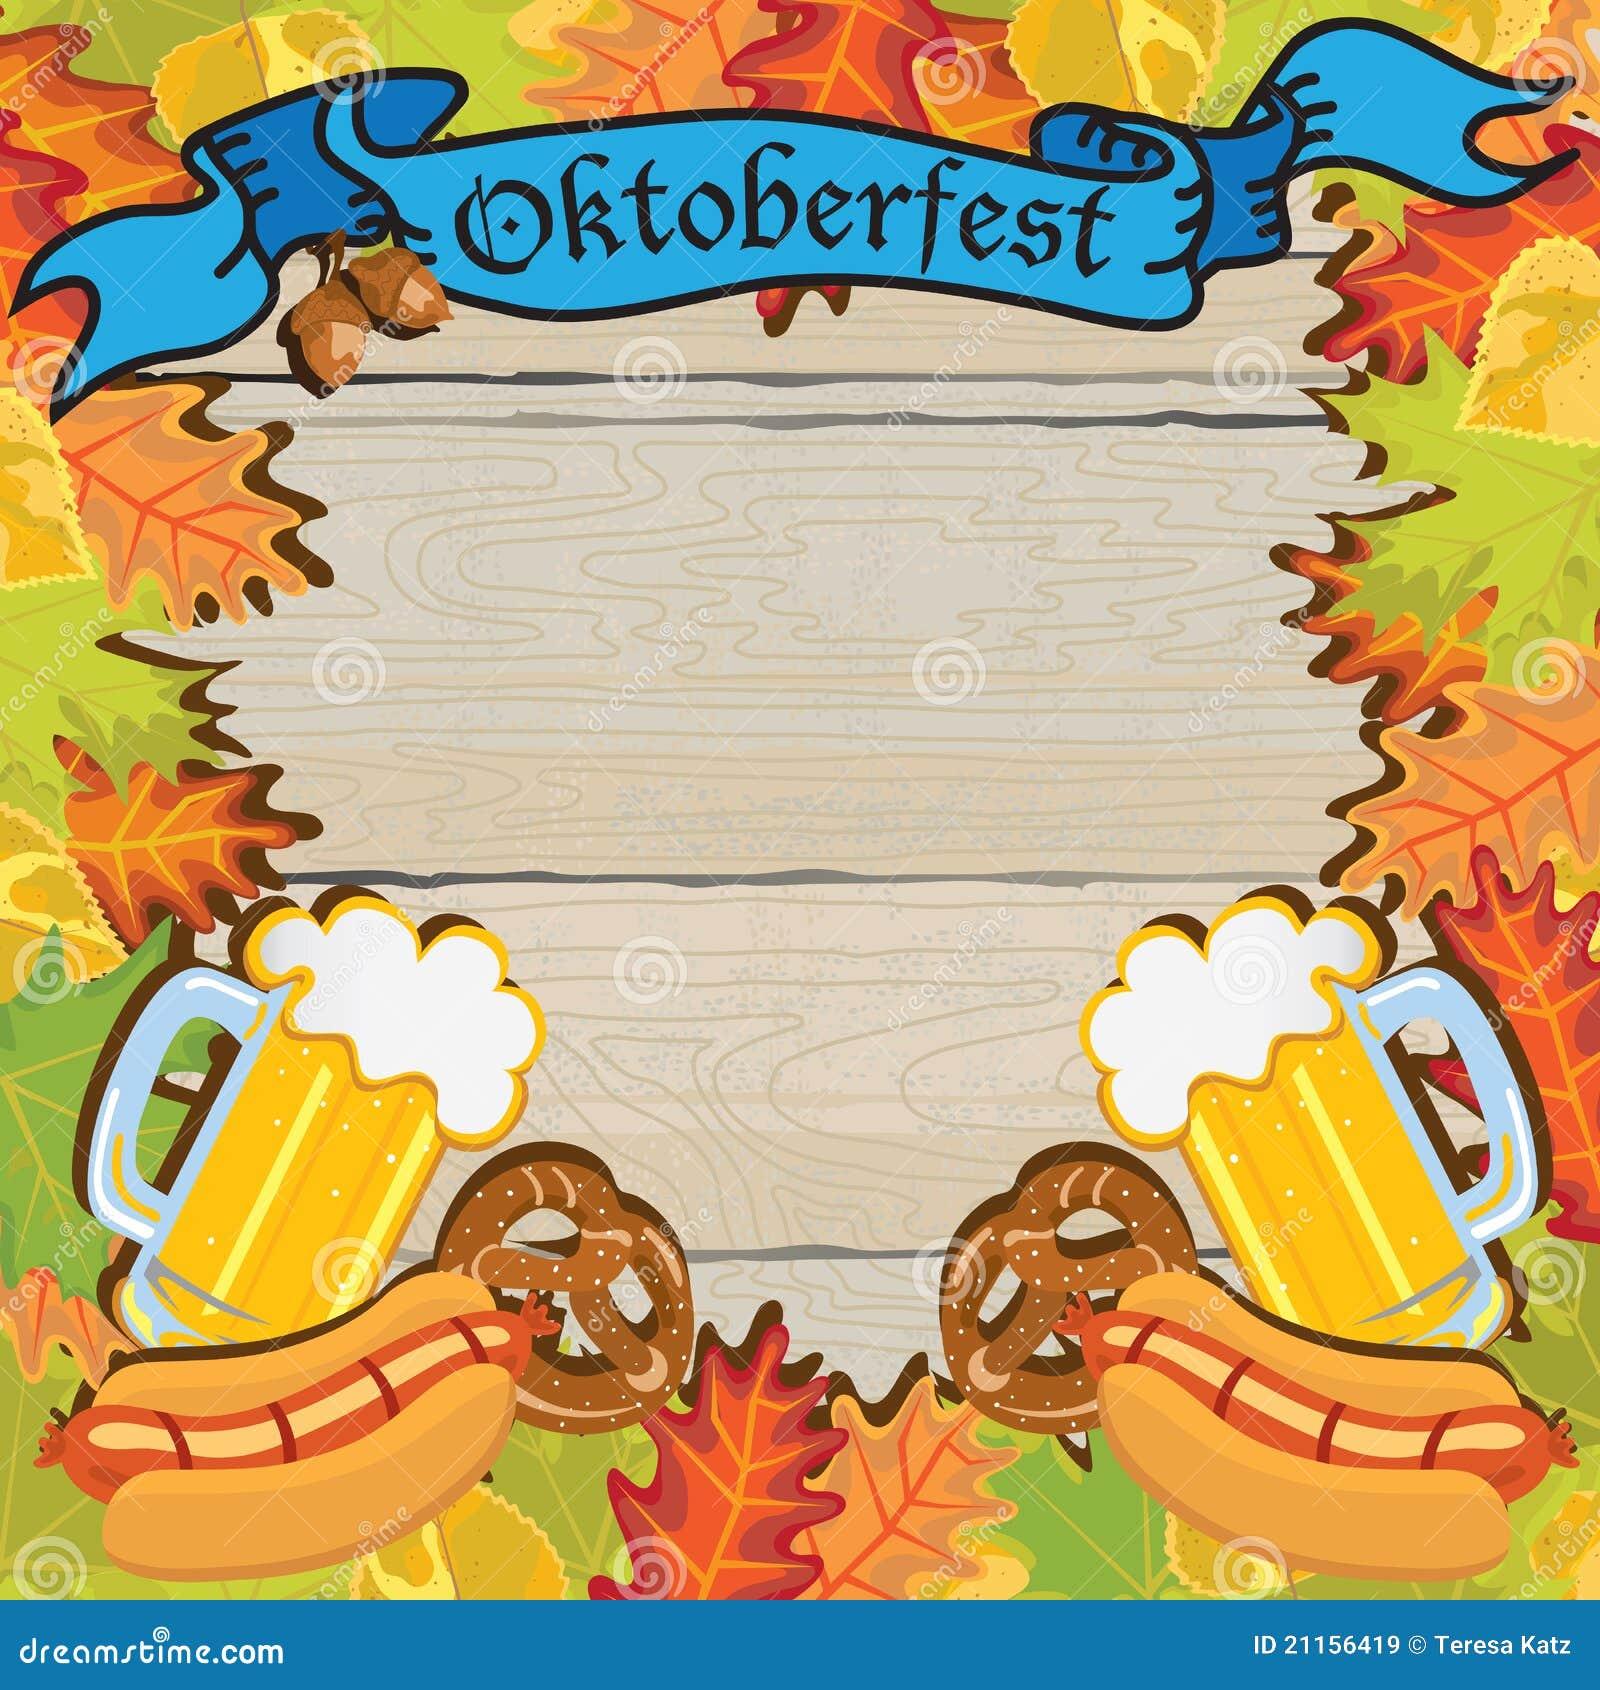 Oktoberfest Party Frame Invitation Poster Editorial Image – Oktoberfest Party Invitations